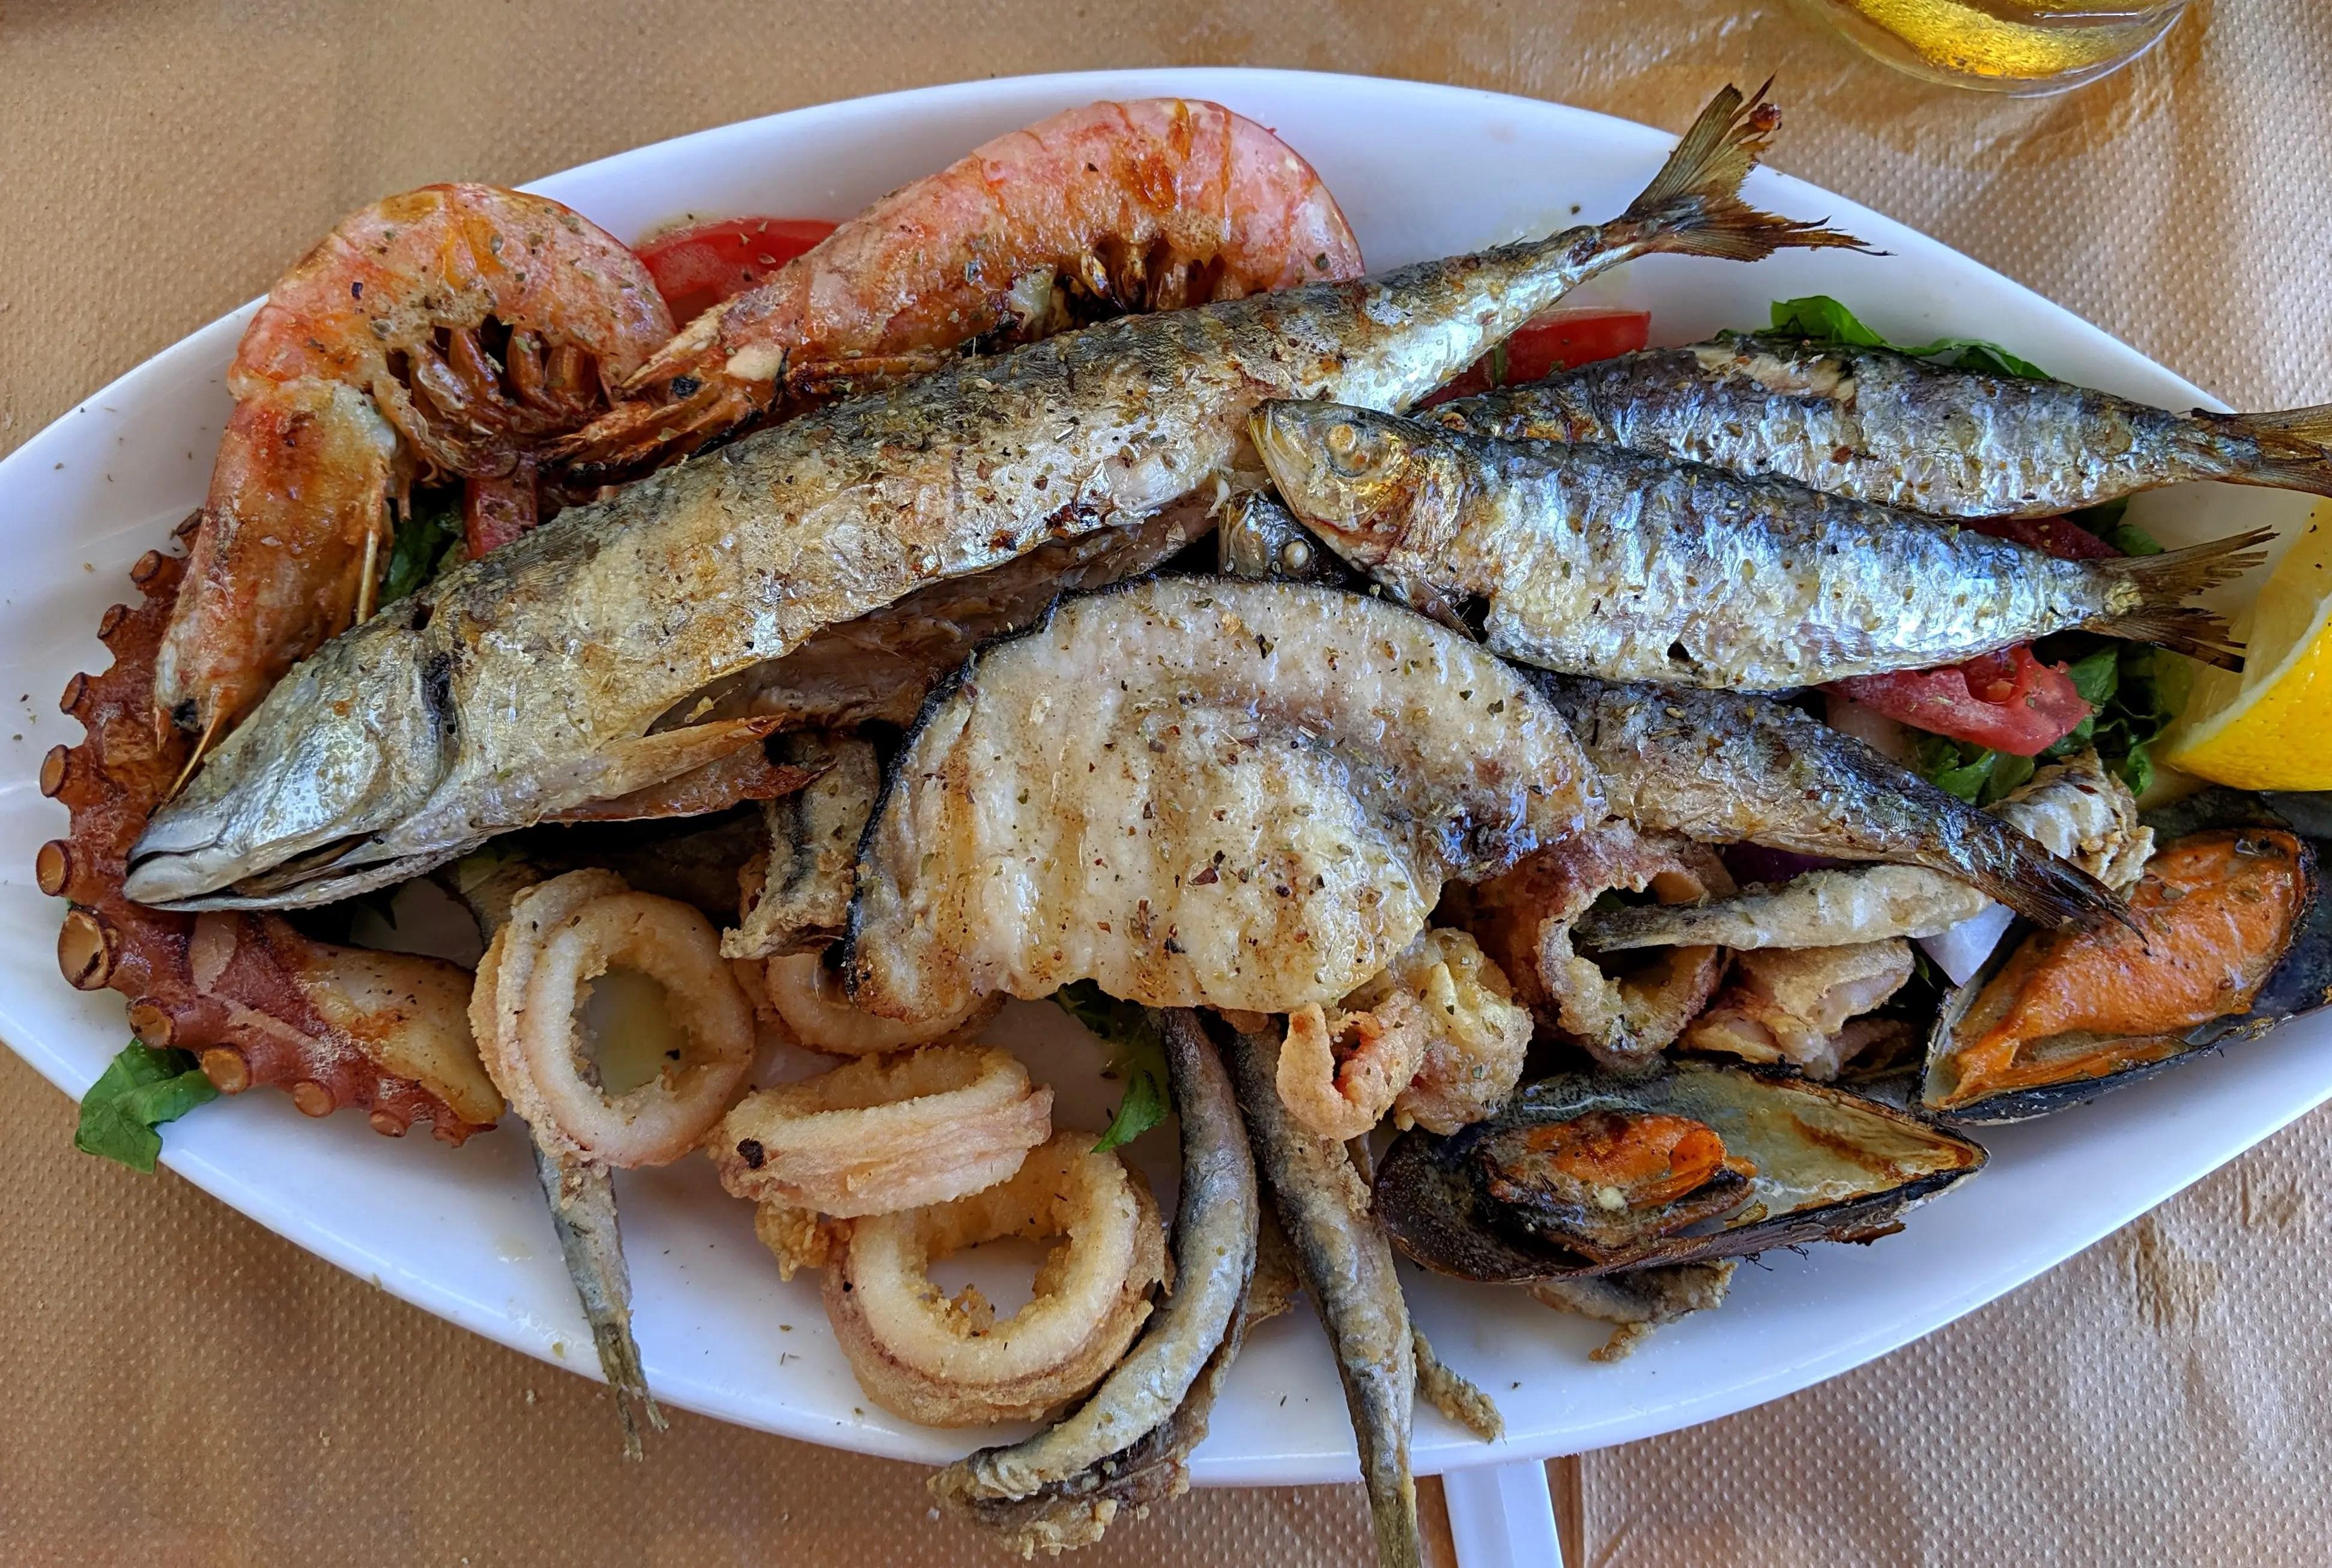 Mixed seafood at Yiannoulis Taverna in Parikia